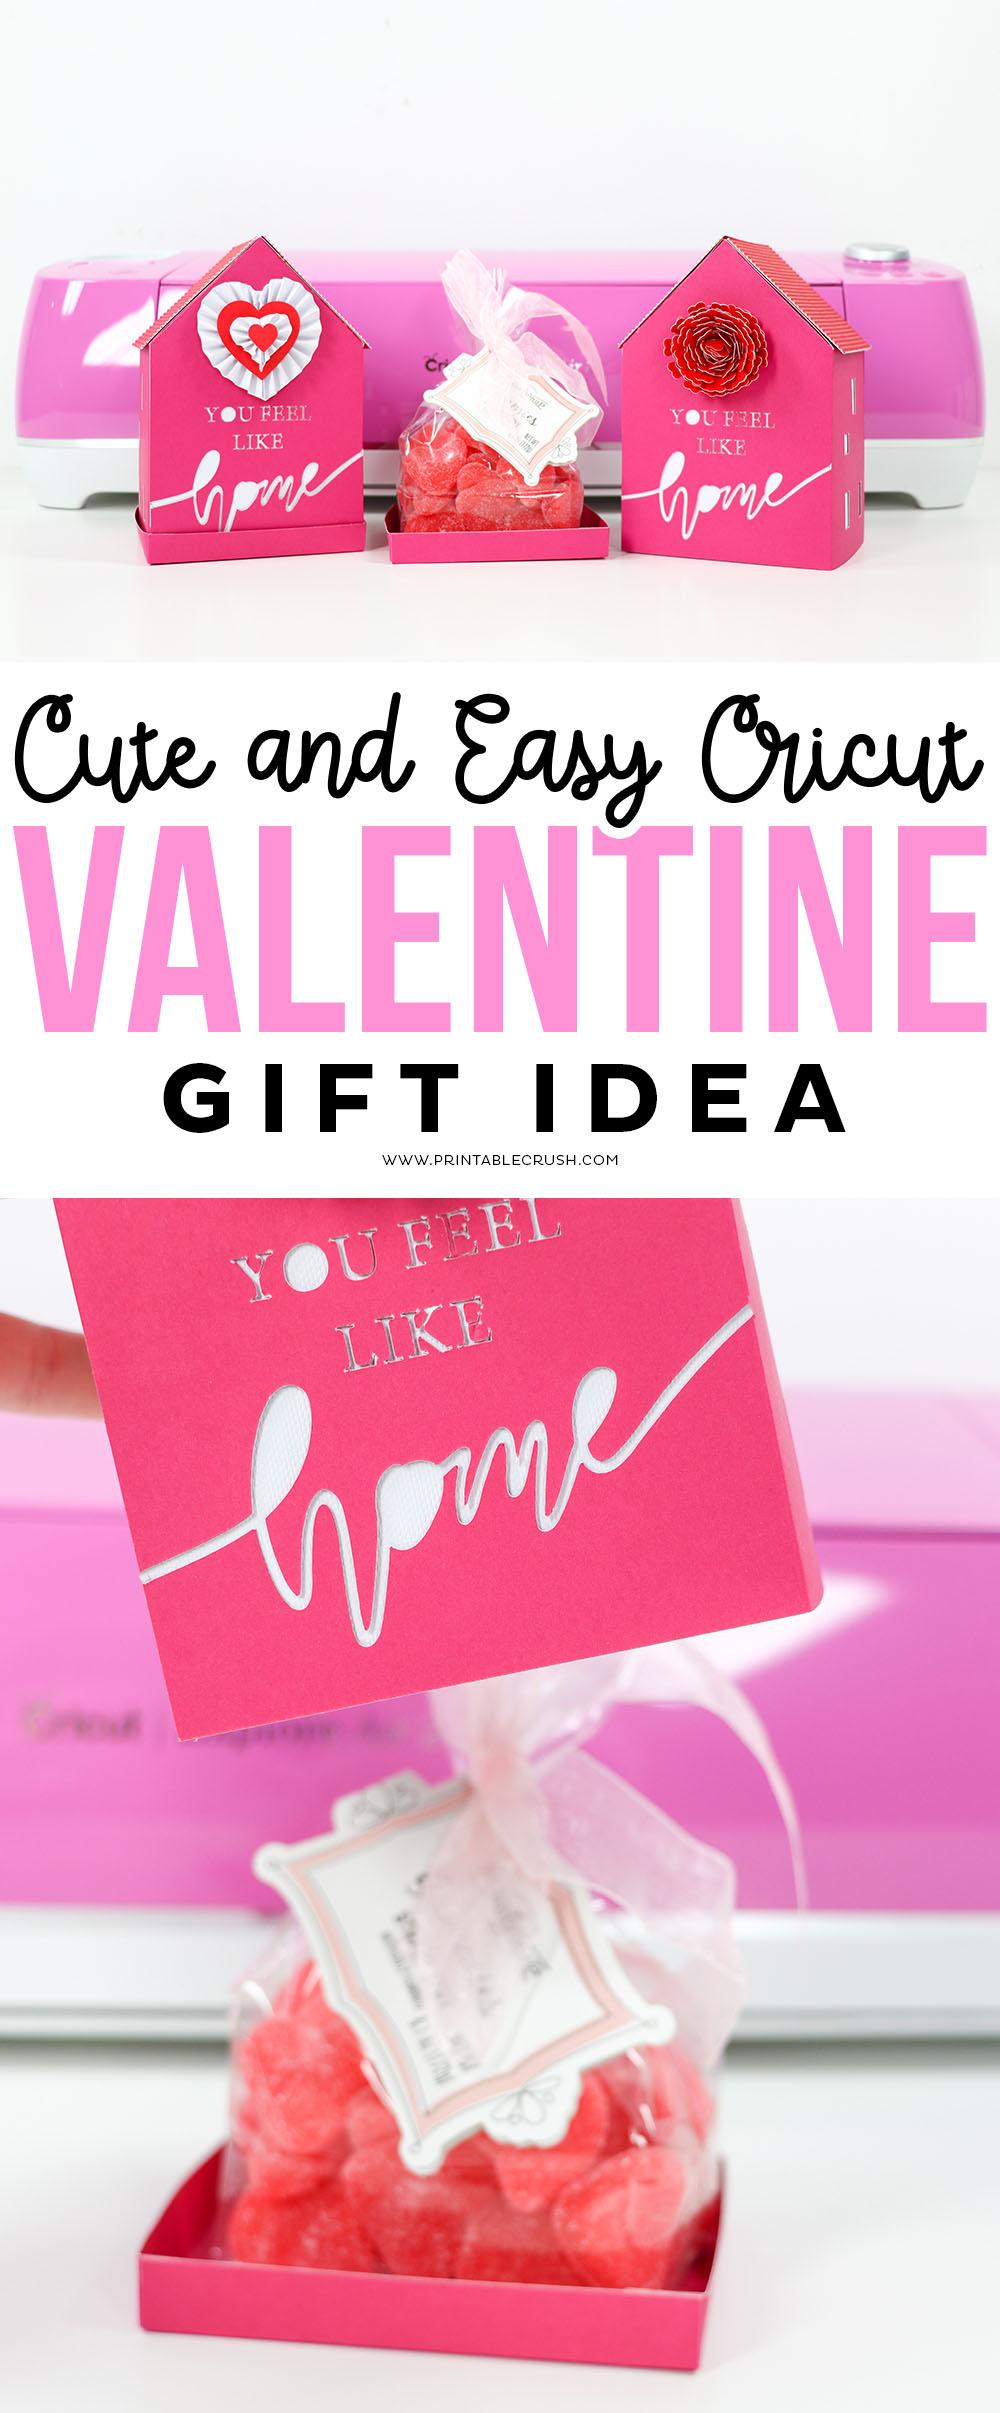 "Easy Cricut Valentine's Day Gift Idea. ""You Feel Like Home"" Valentine Gift Boxes.#cricutmade #sayitwithcricut #cricutexploreair2 #cricutcraft #cricutmachine #valentinesdaygift #valentine #valentinesdaycrafts via @printablecrush"